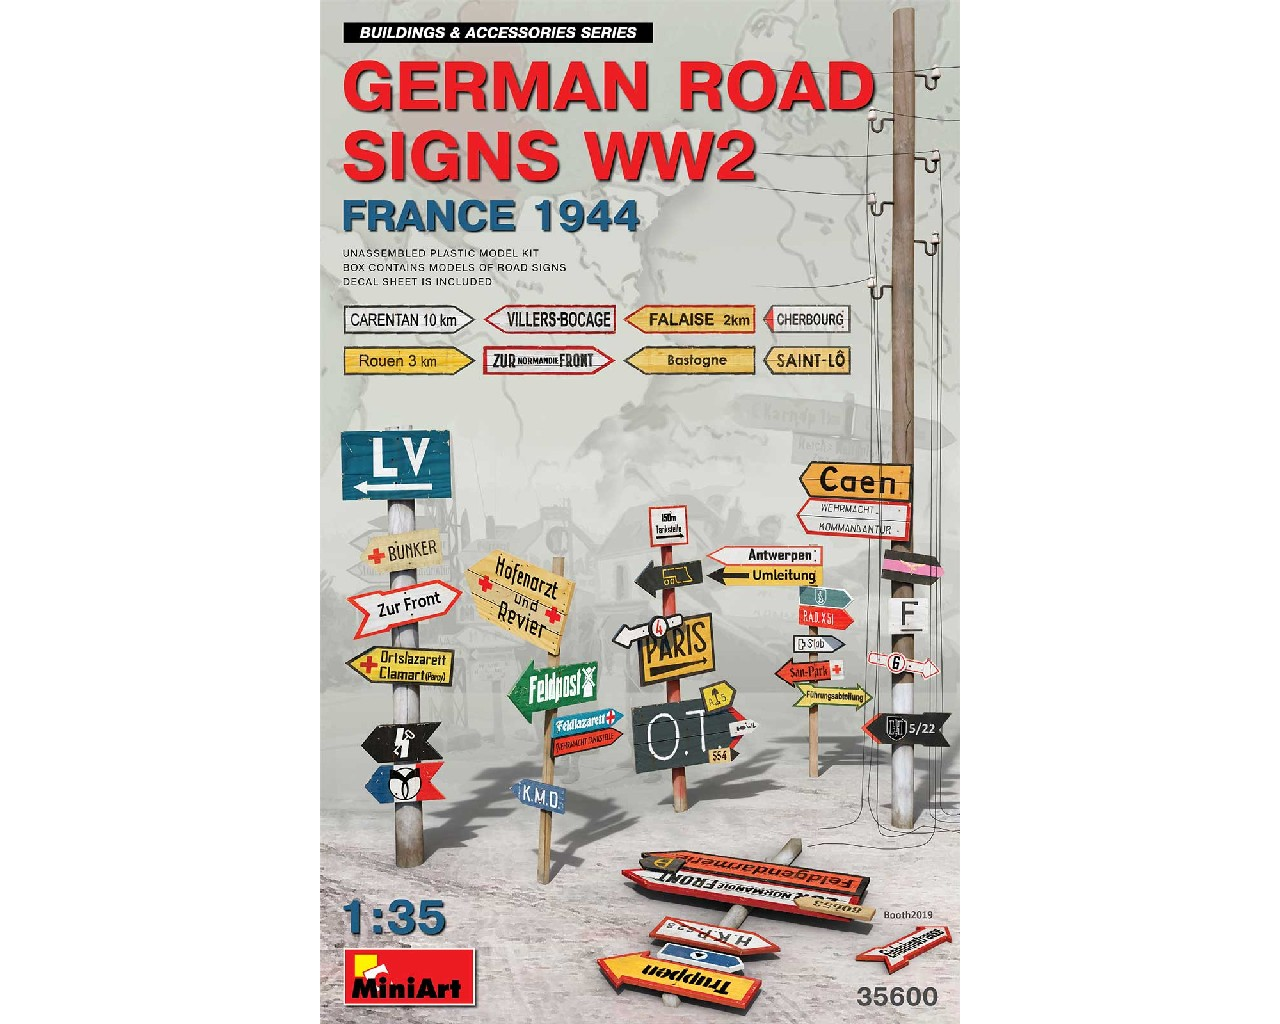 1/35 German Road Signs WW2 (France 1944)